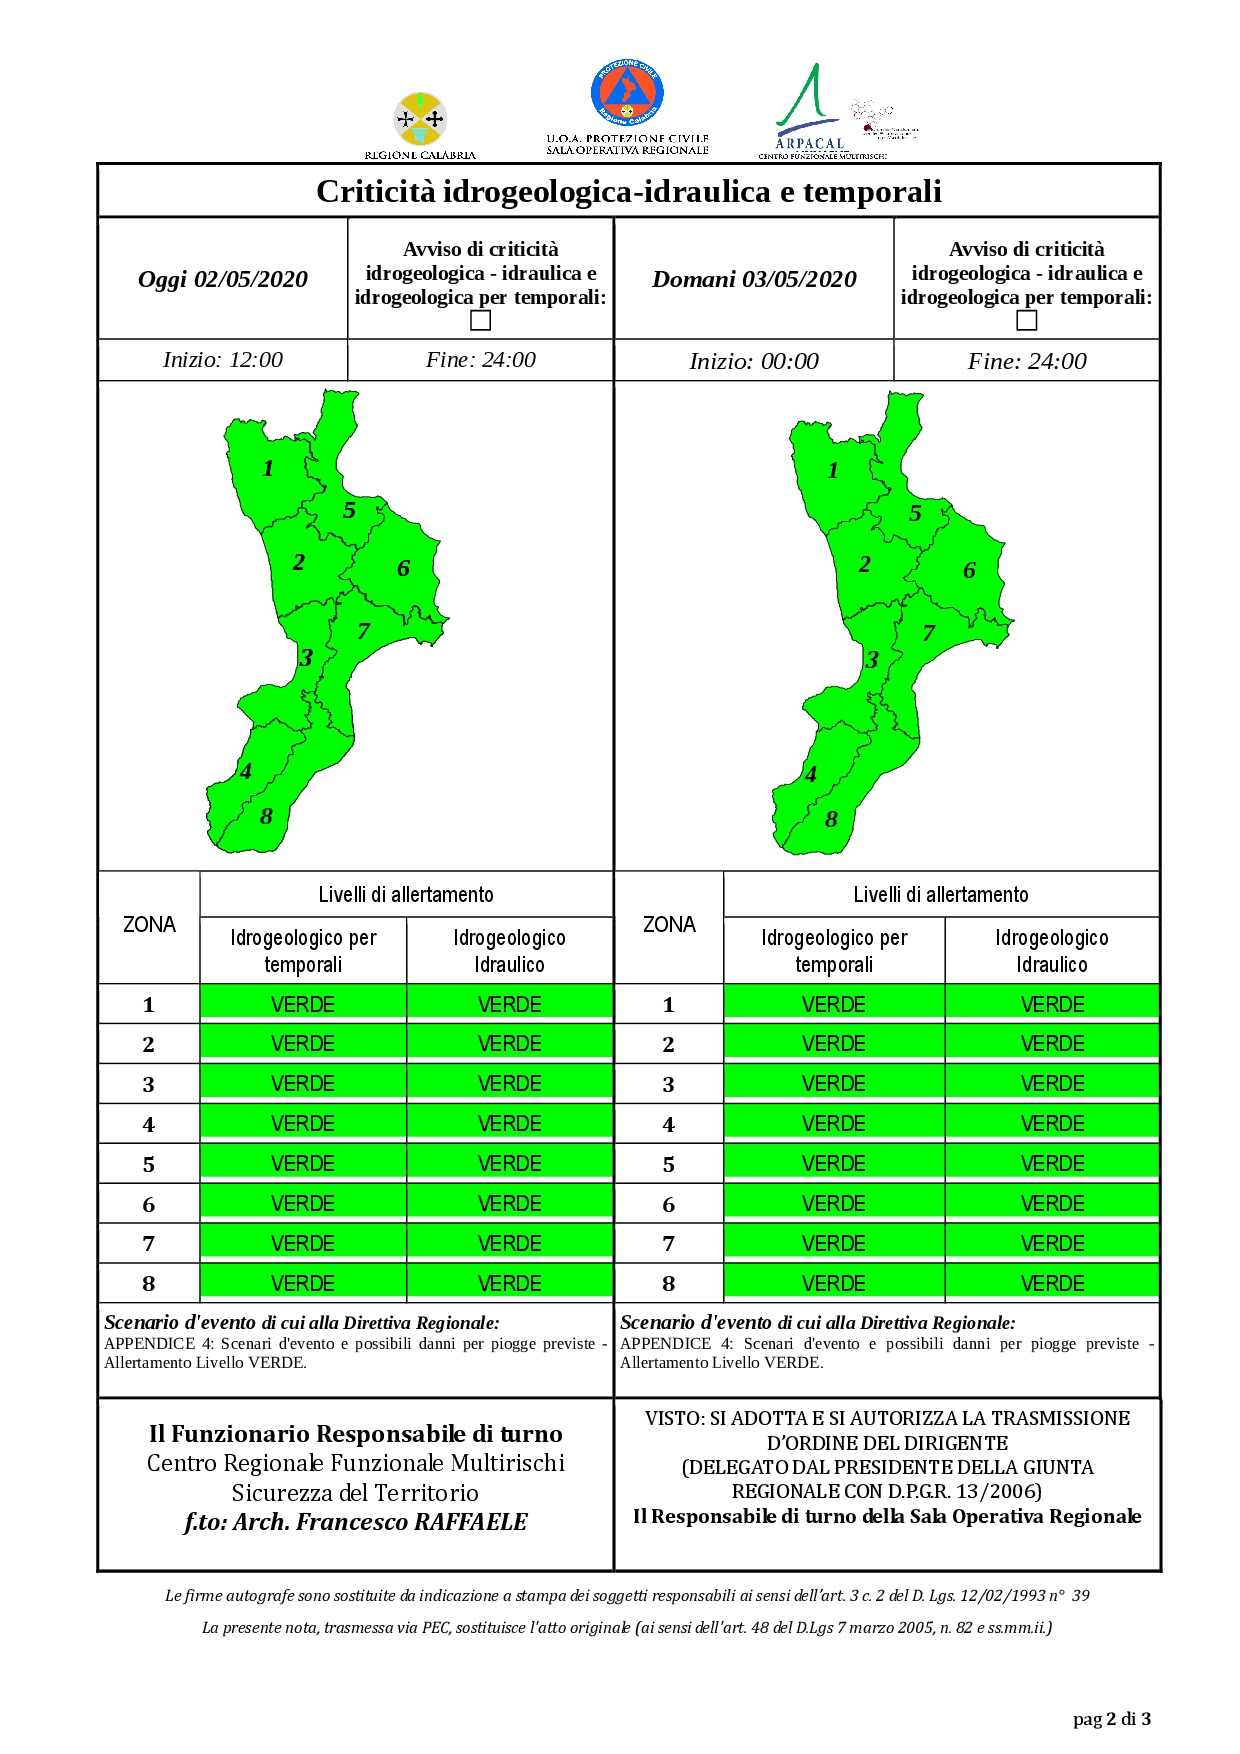 Criticità idrogeologica-idraulica e temporali in Calabria 02-05-2020